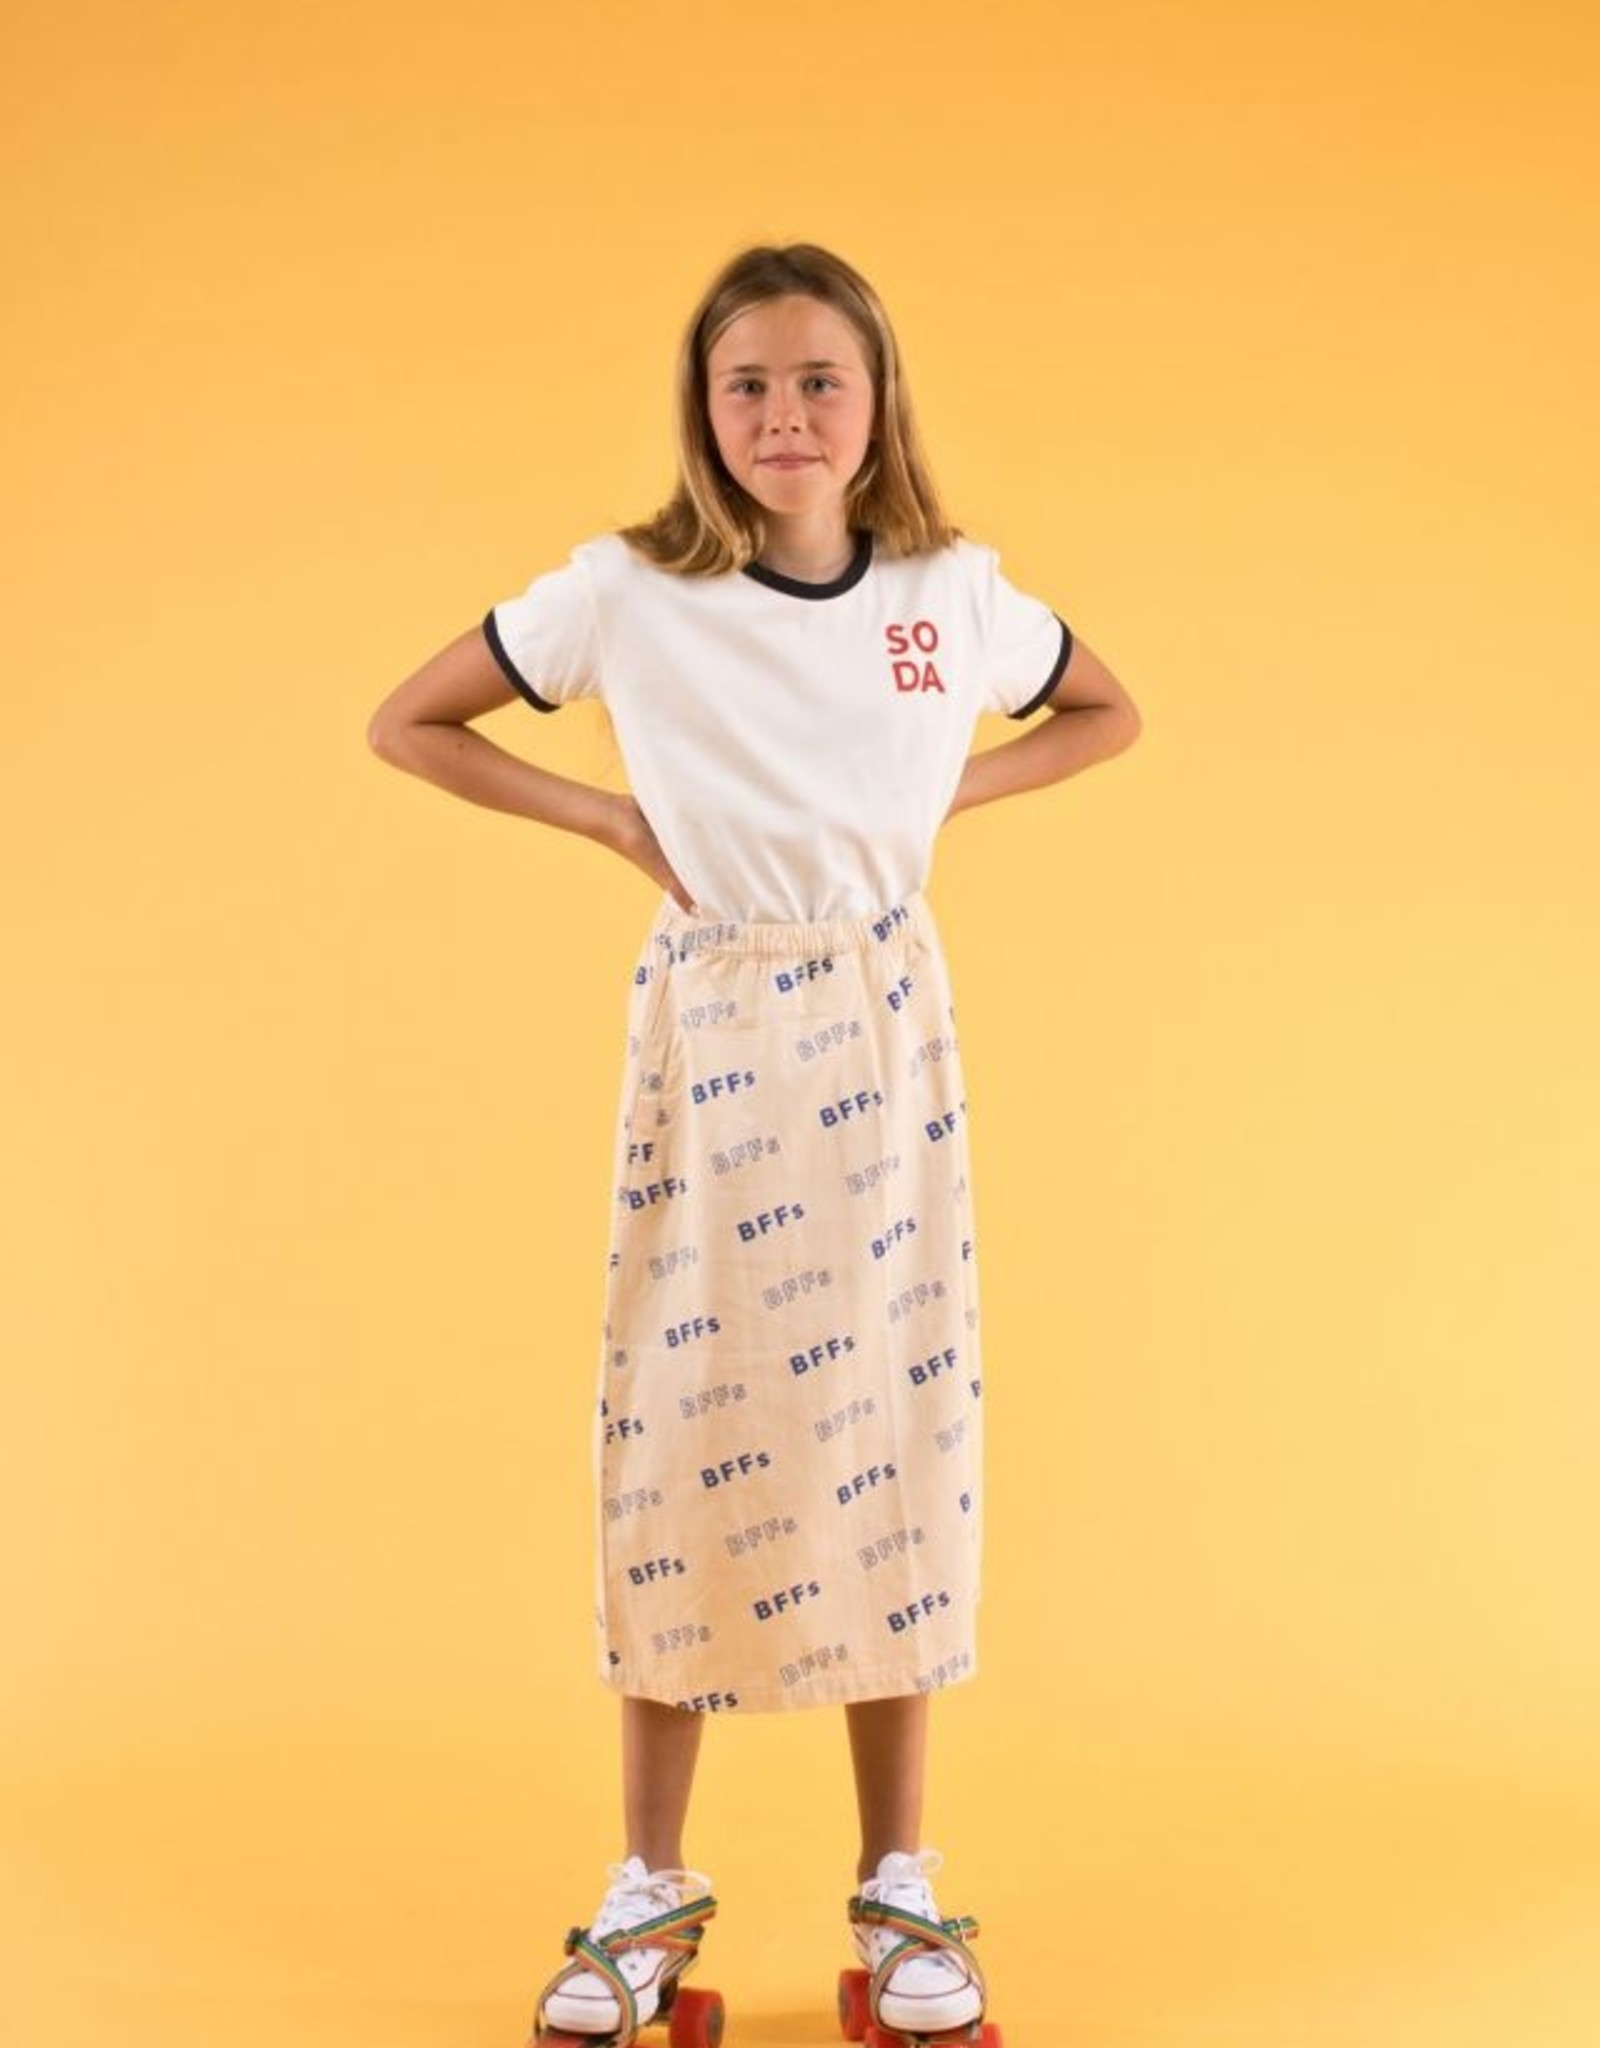 Tinycottons BFFS skirt